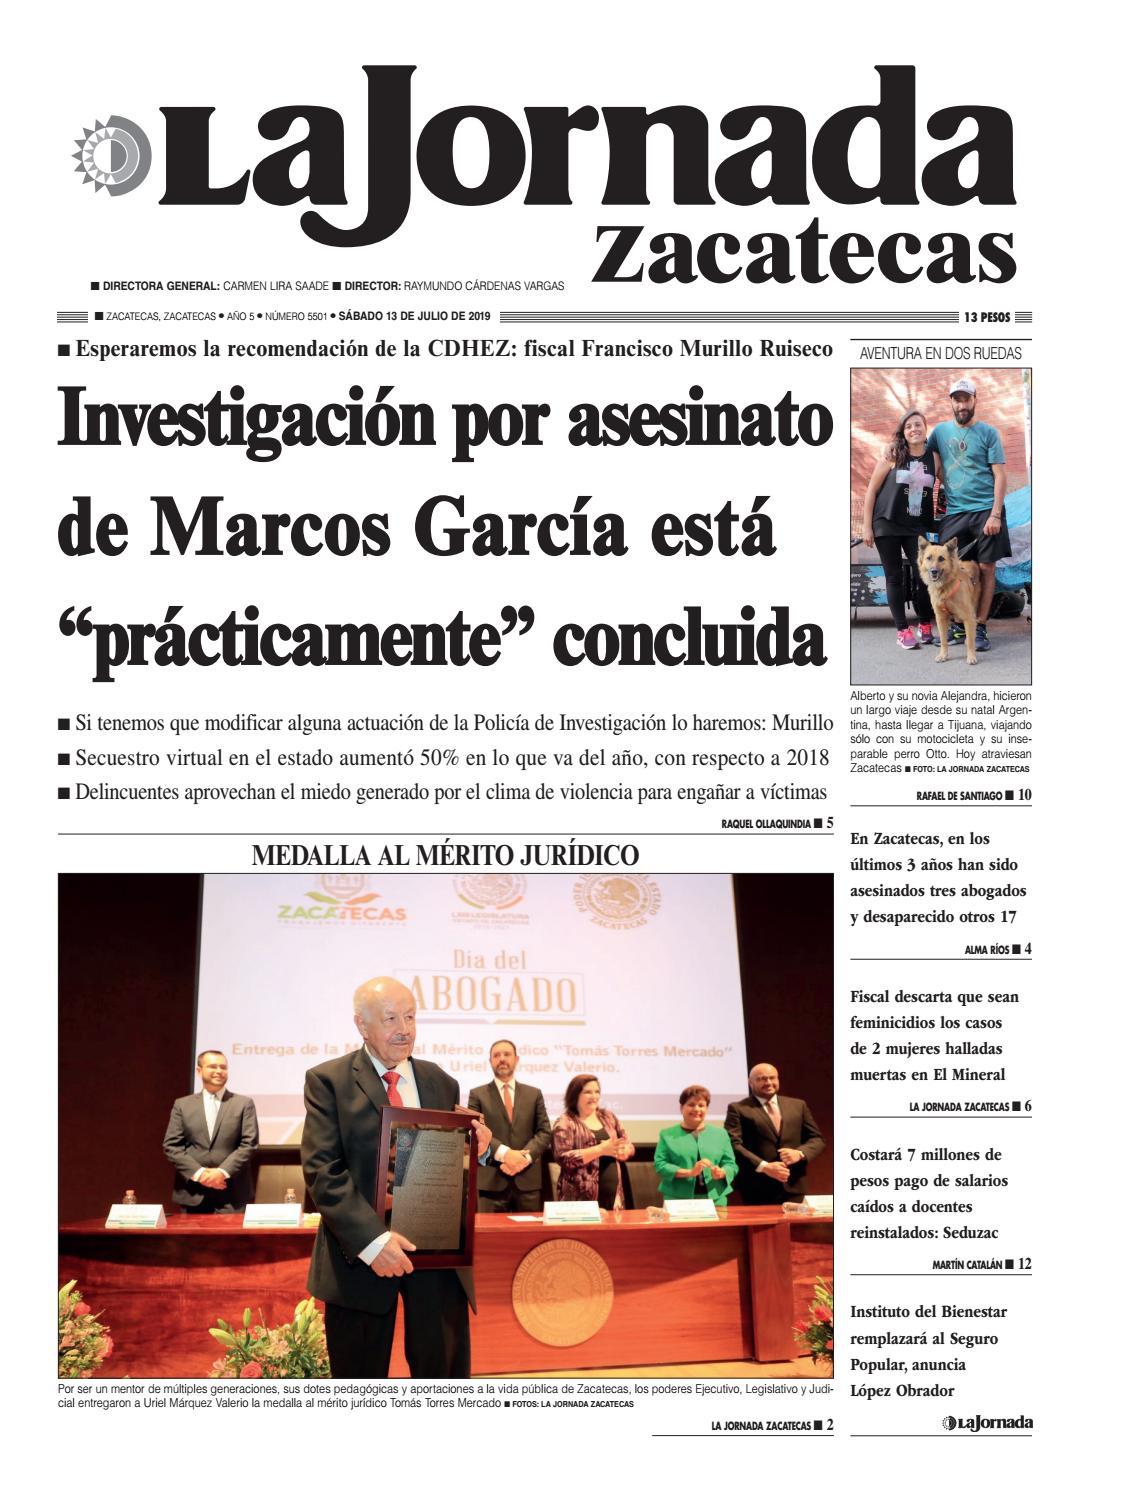 b56043875 La Jornada Zacatecas Sábado 13 de Julio de 2019 by La Jornada ...